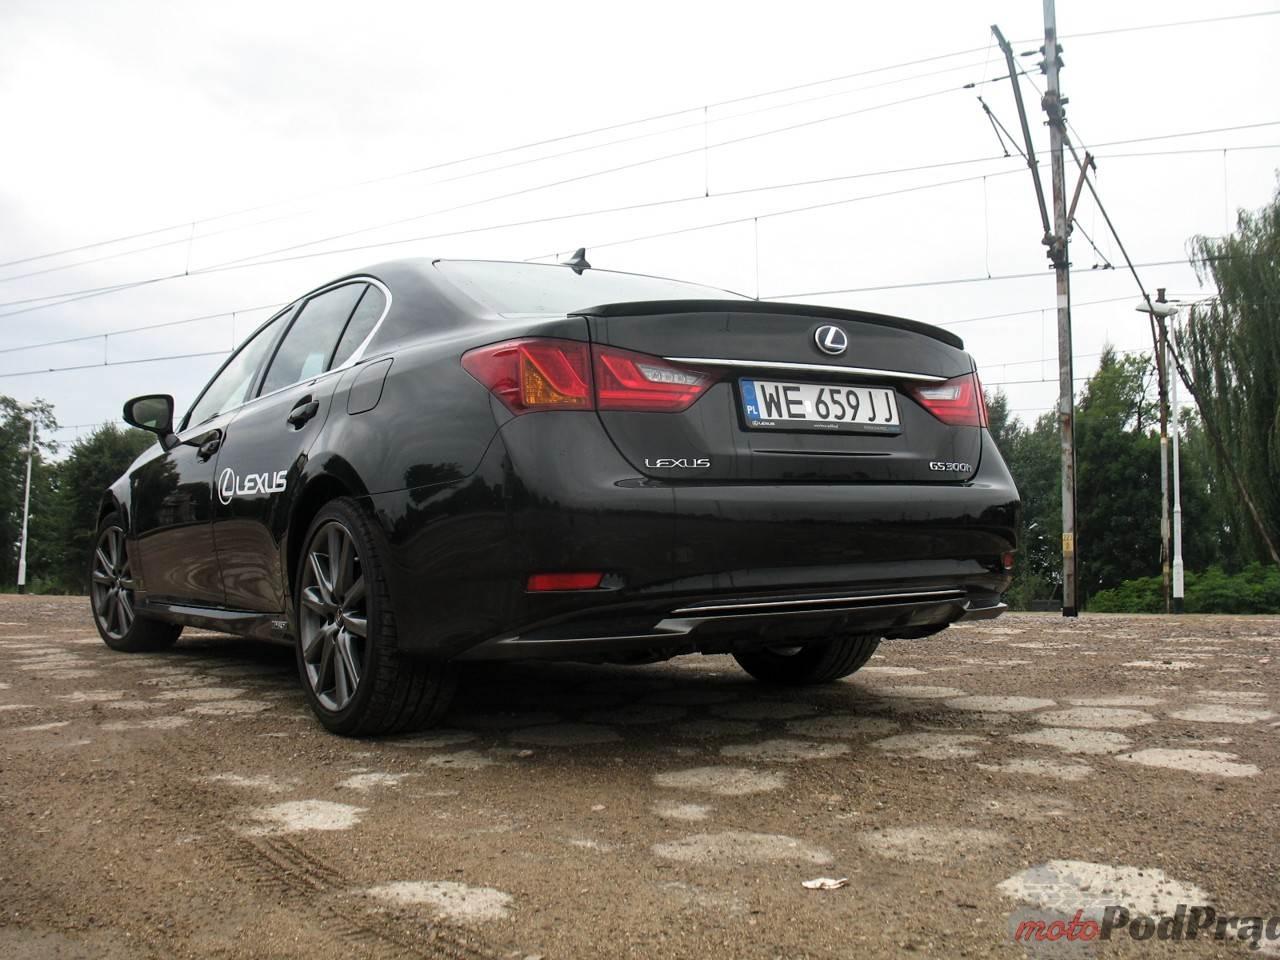 Lexus GS 300 H 33 Test: Lexus GS 300 h